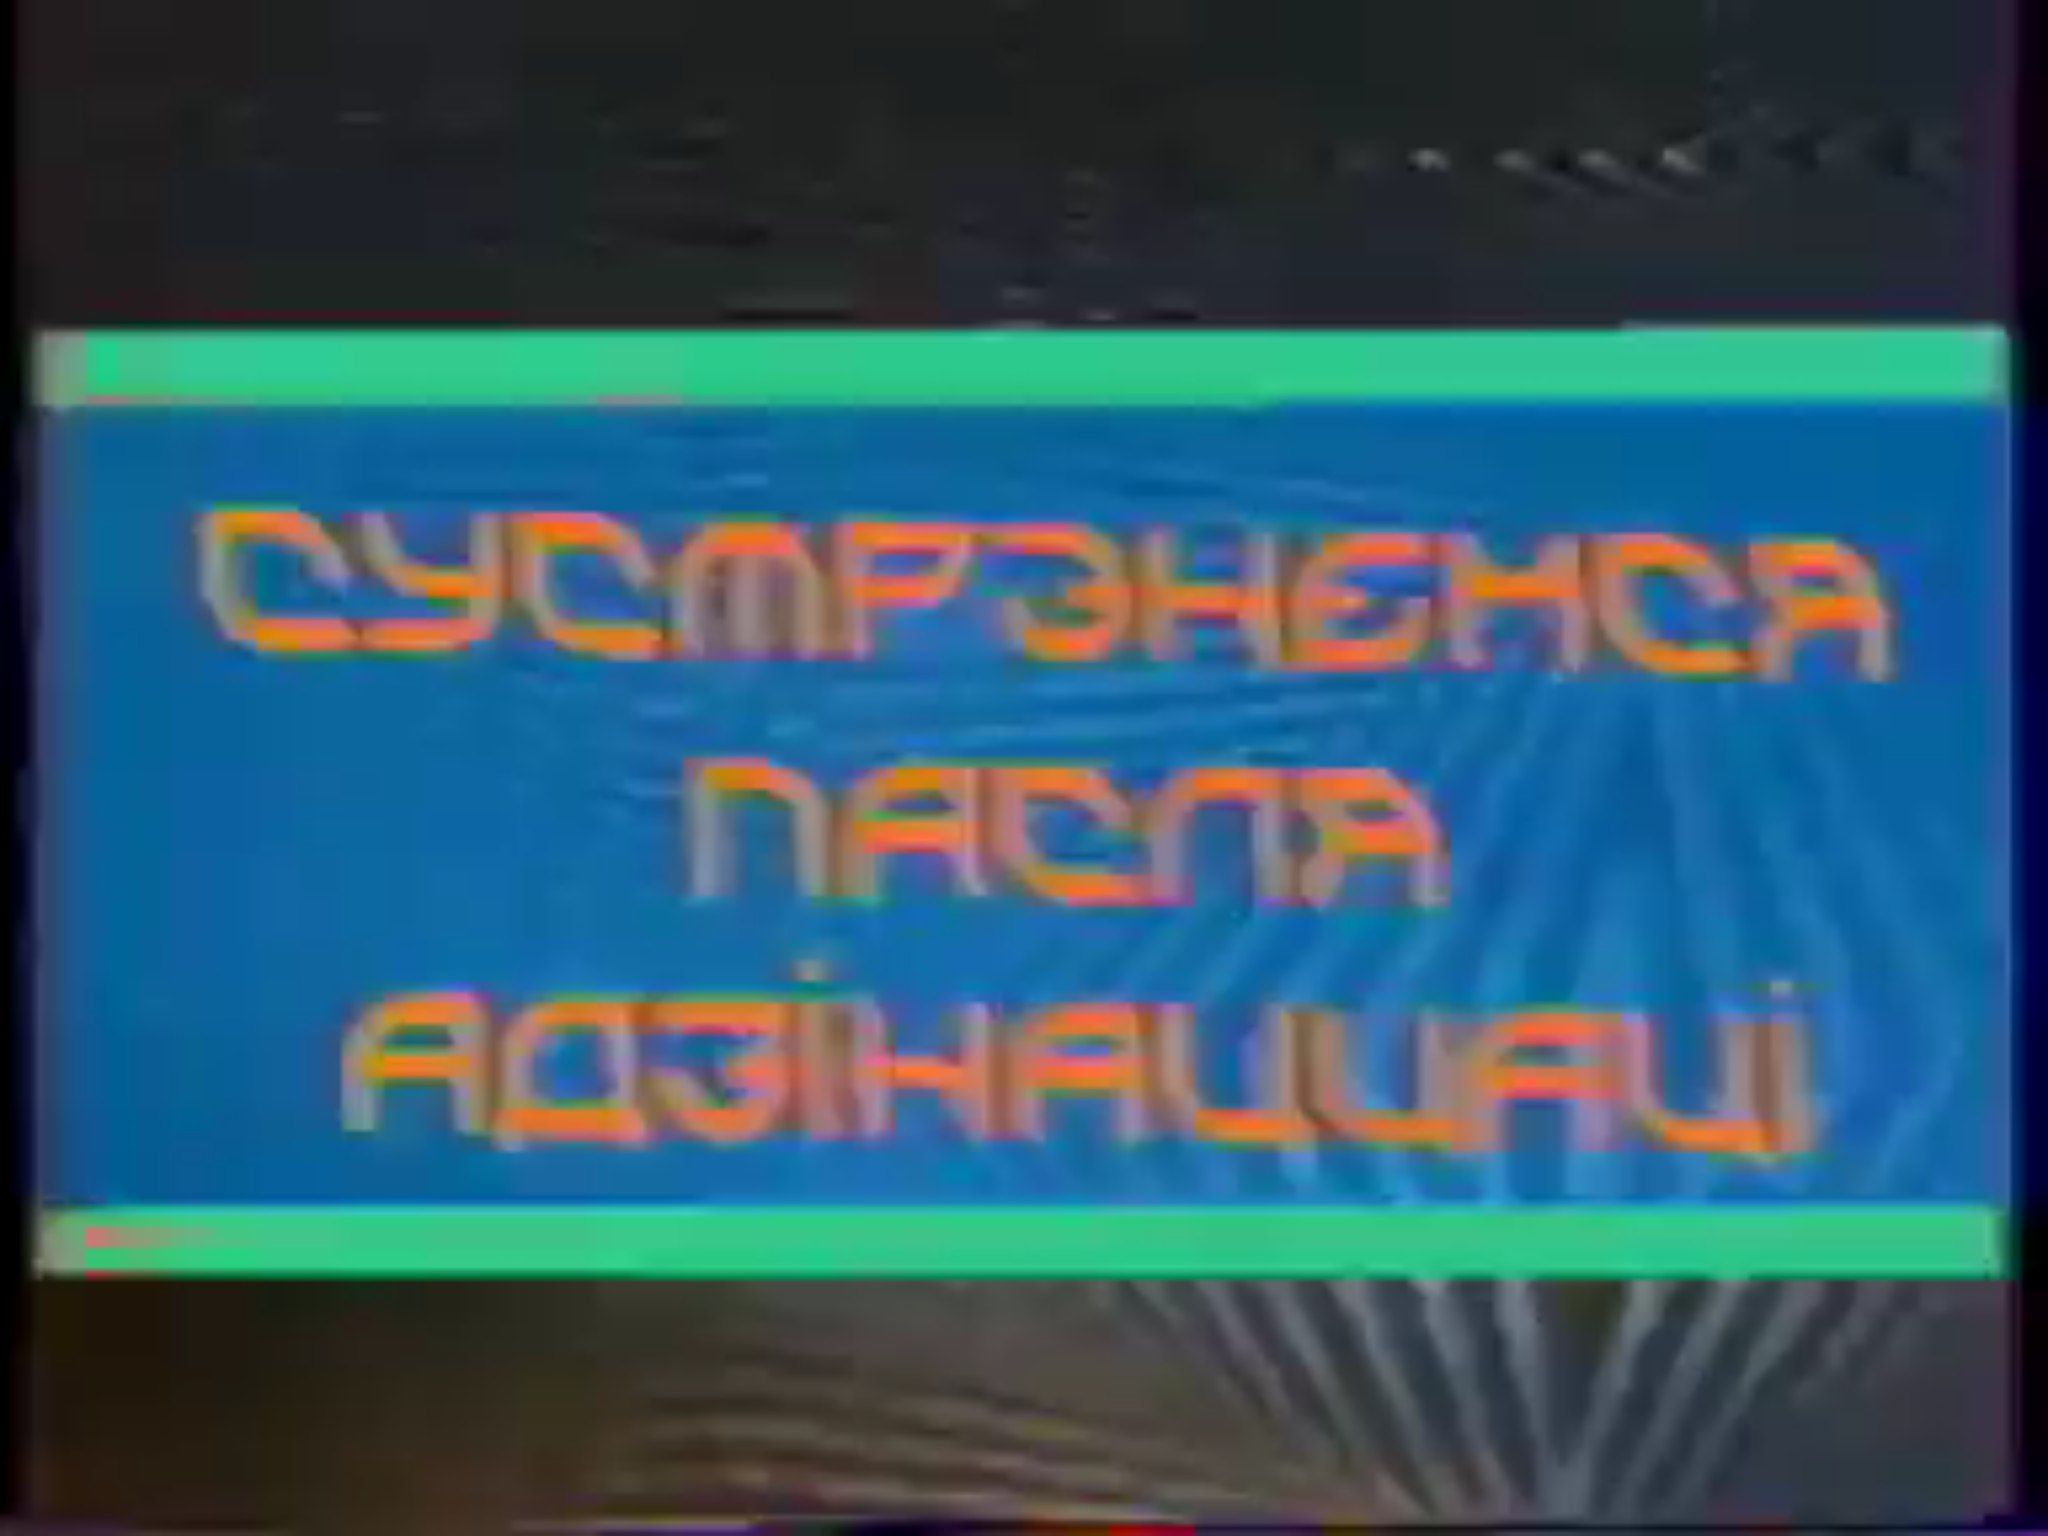 Встретимся после одиннадцати (Белорусская программ ЦТ СССР, 1982) Надежда Микулич